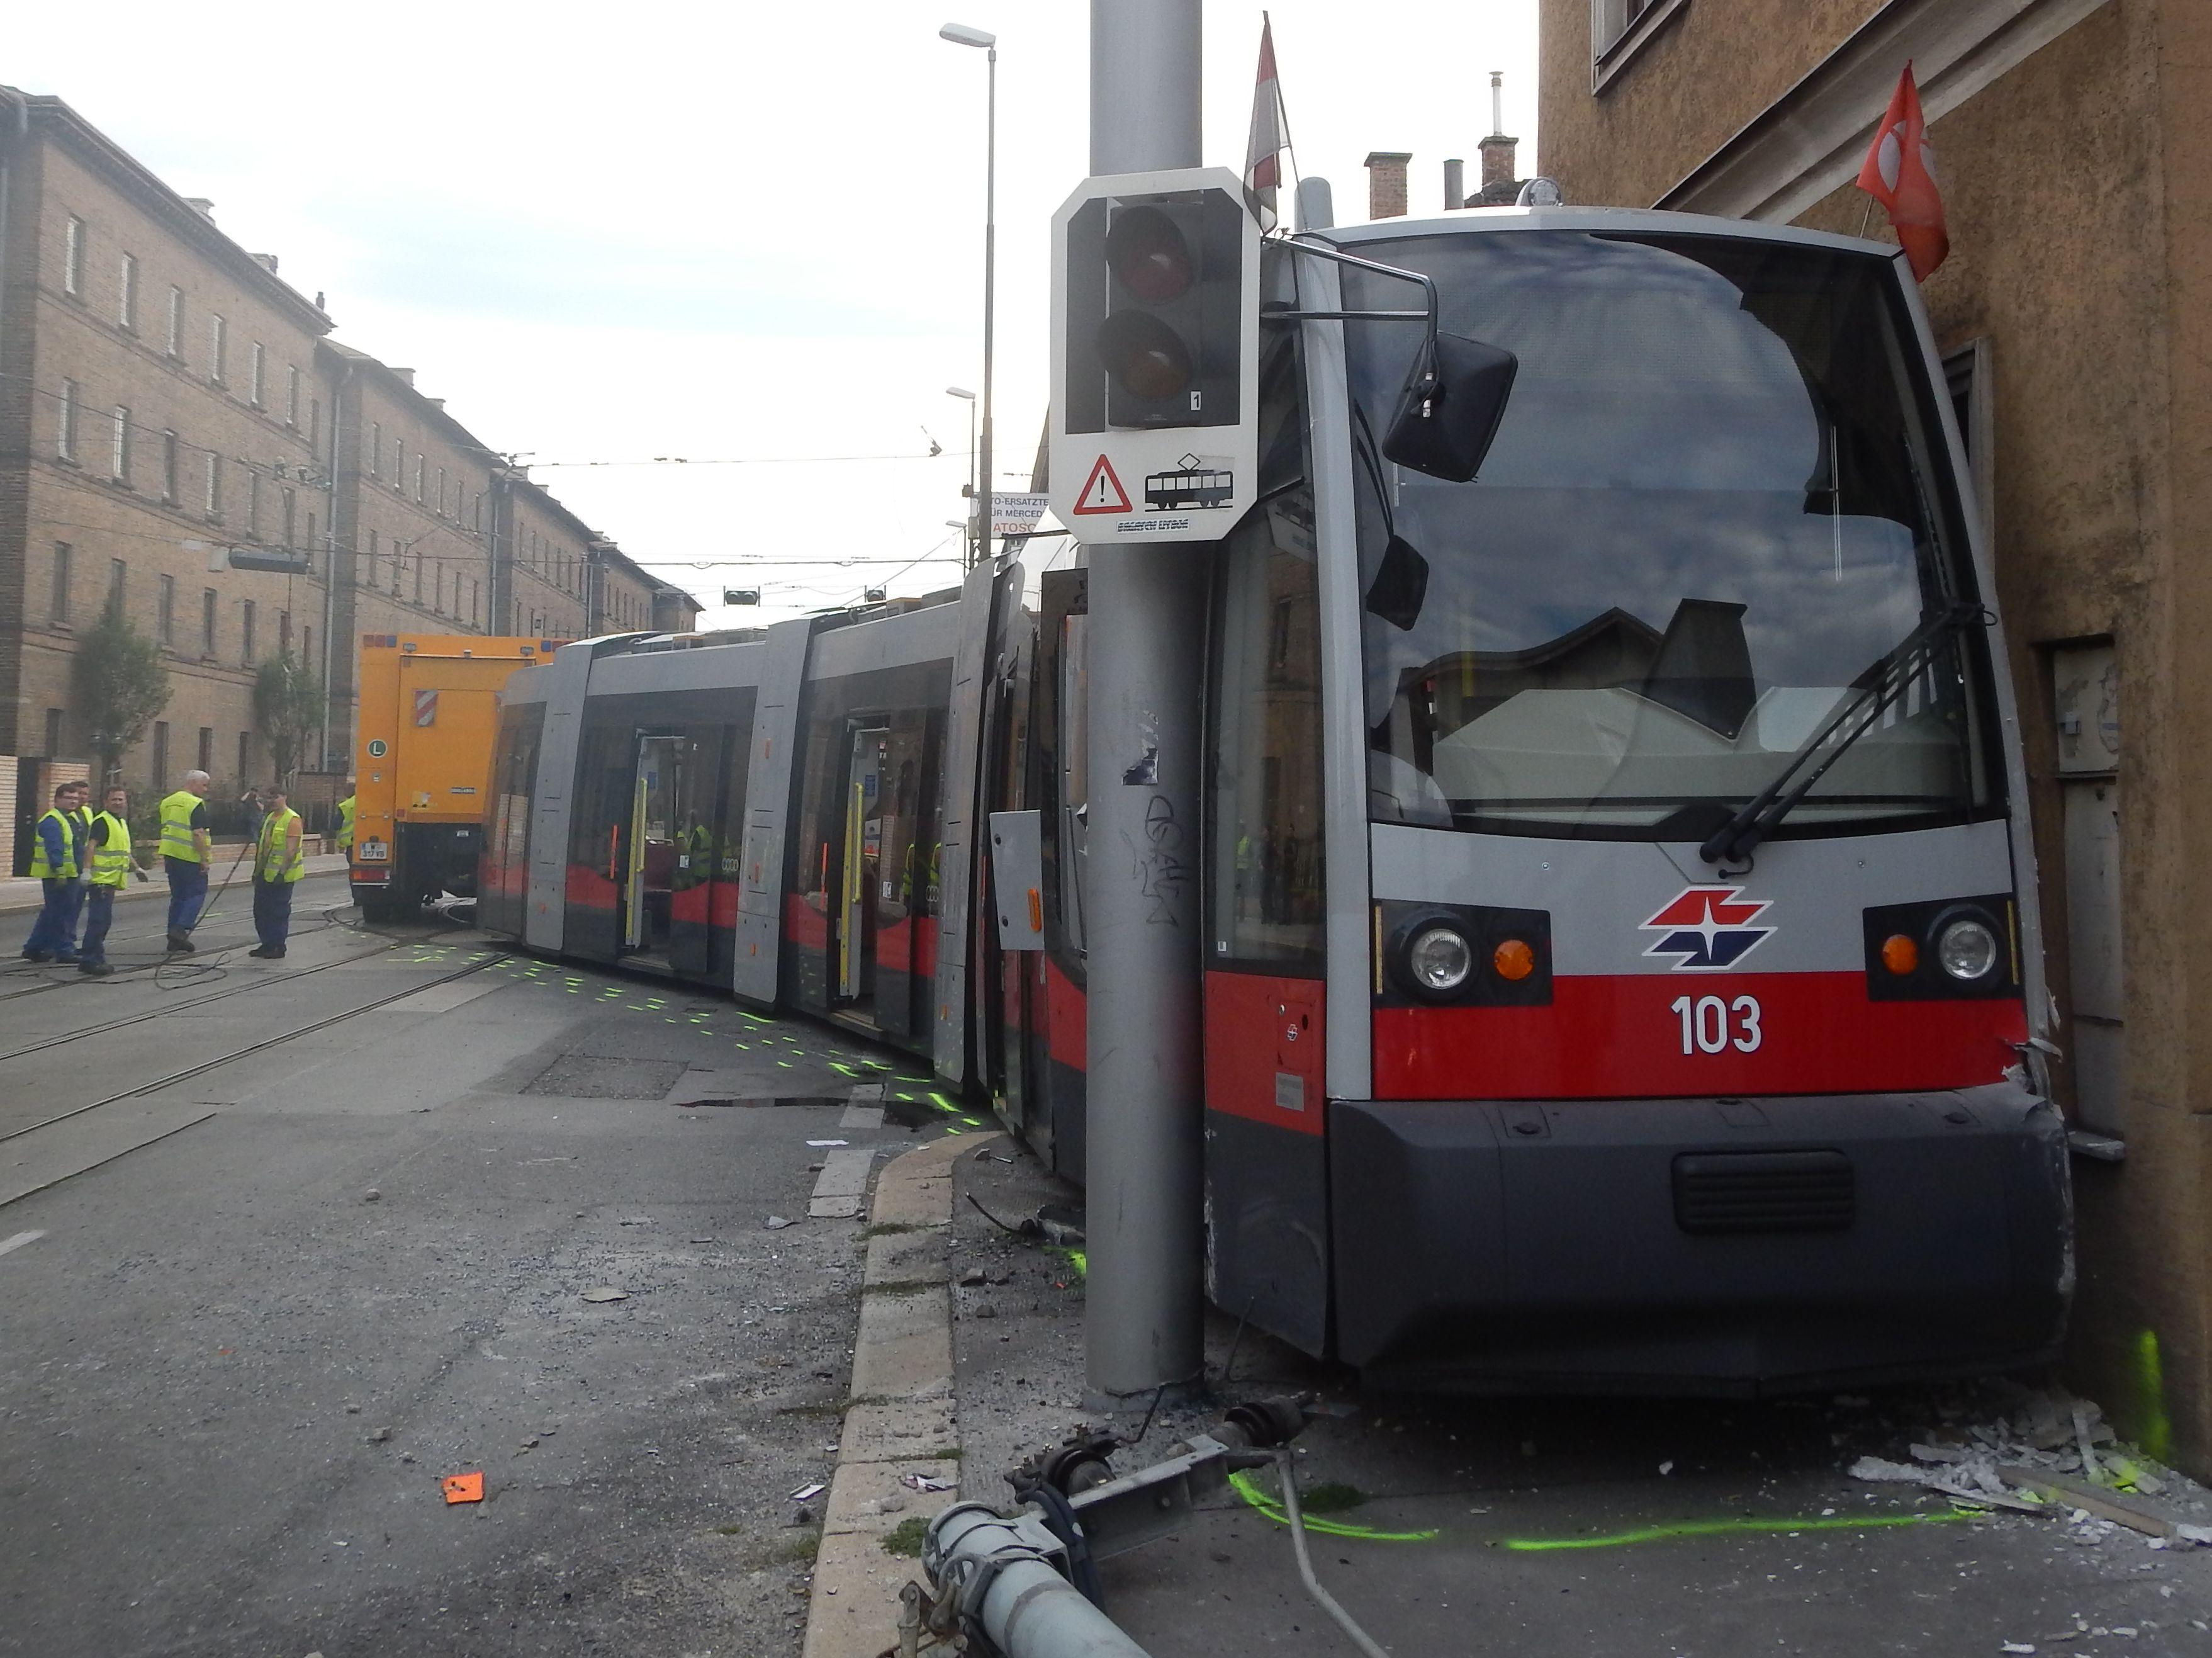 Darmstadt Straßenbahn Unfall Heute